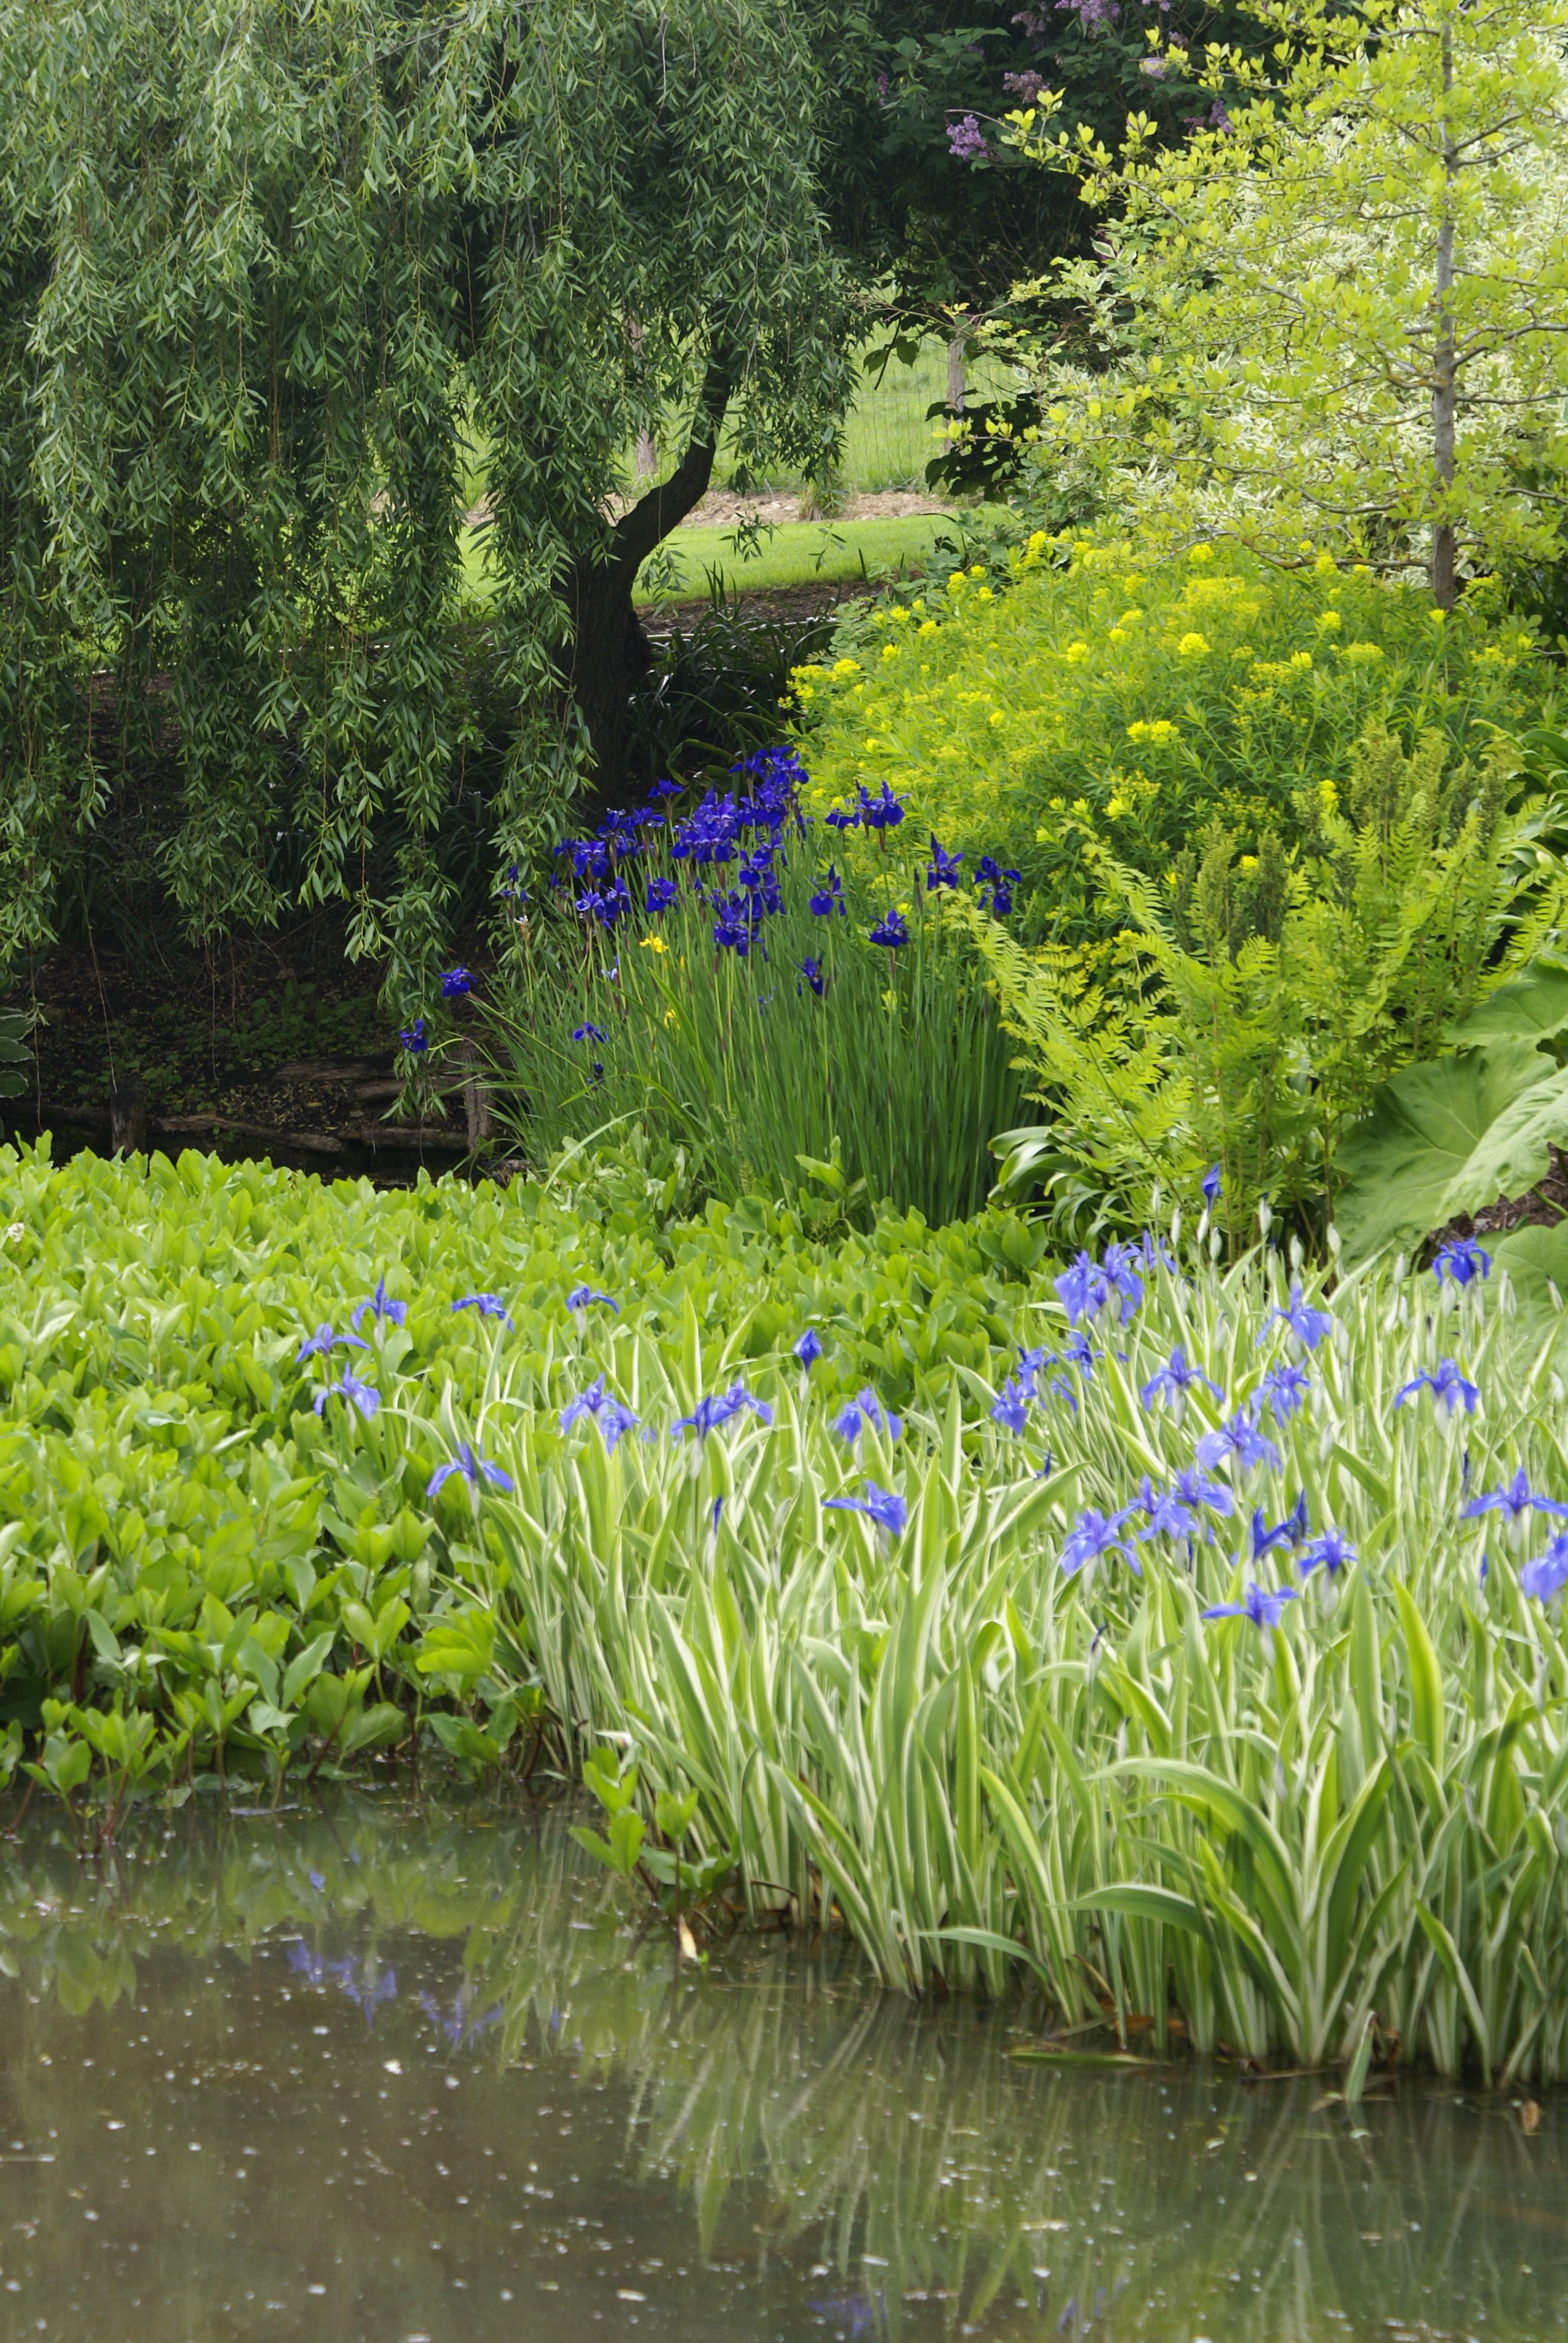 Bordure D Un Etang Amenage Jardin D Eau Bassin De Jardin Beaux Jardins